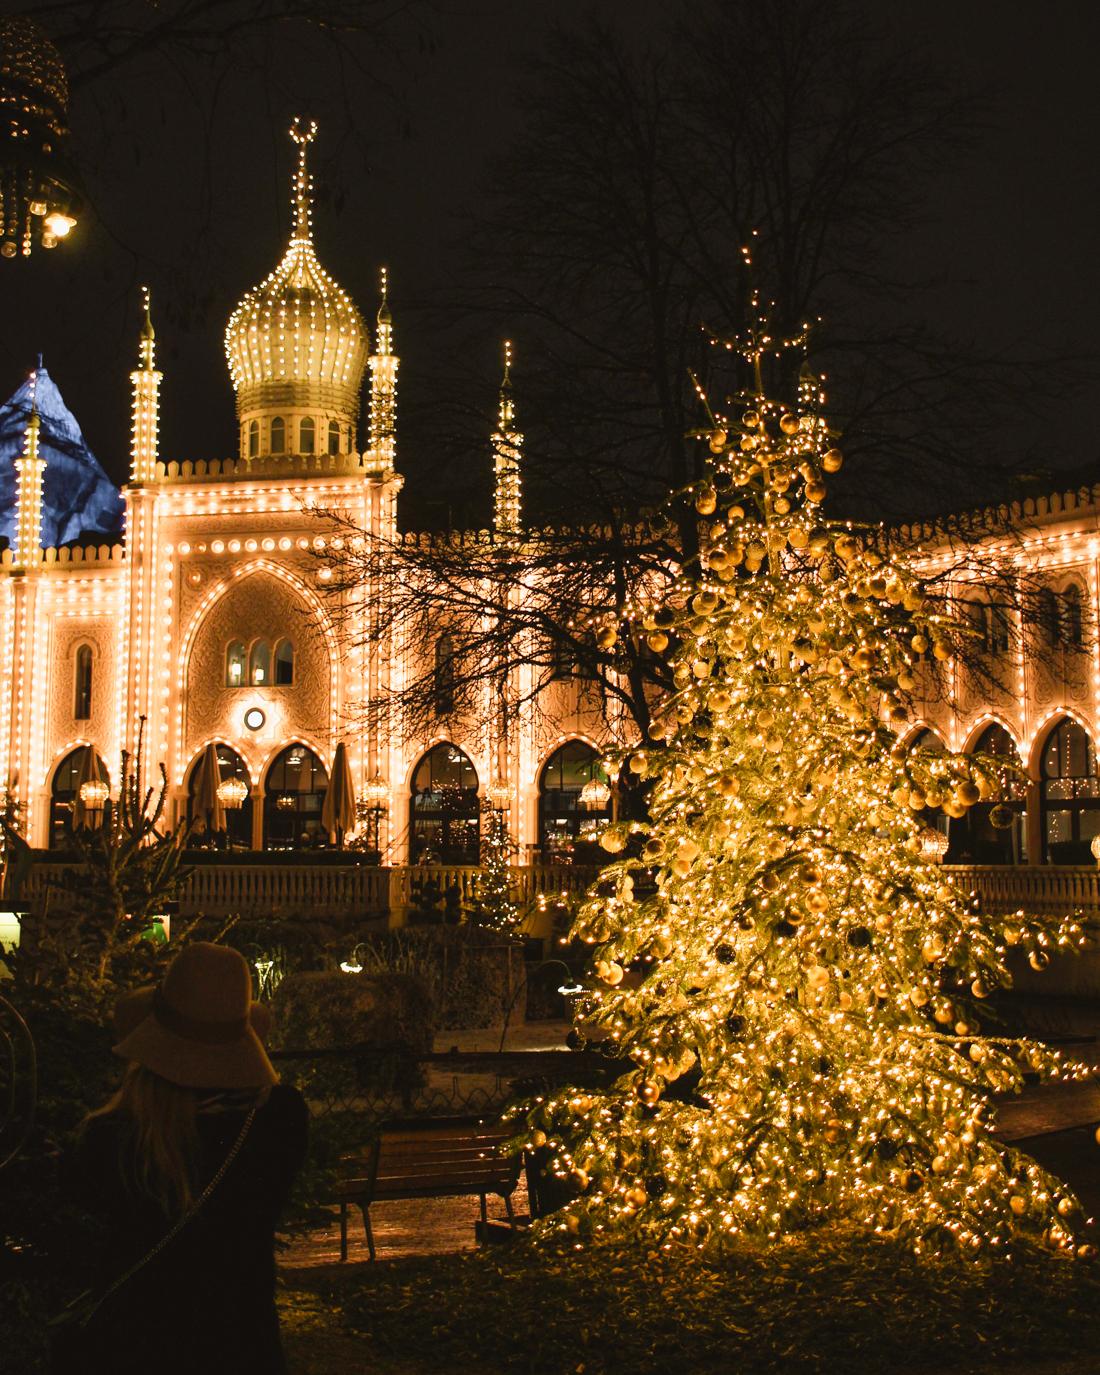 Christmas Market in Tivoli Garden, Copenhagen